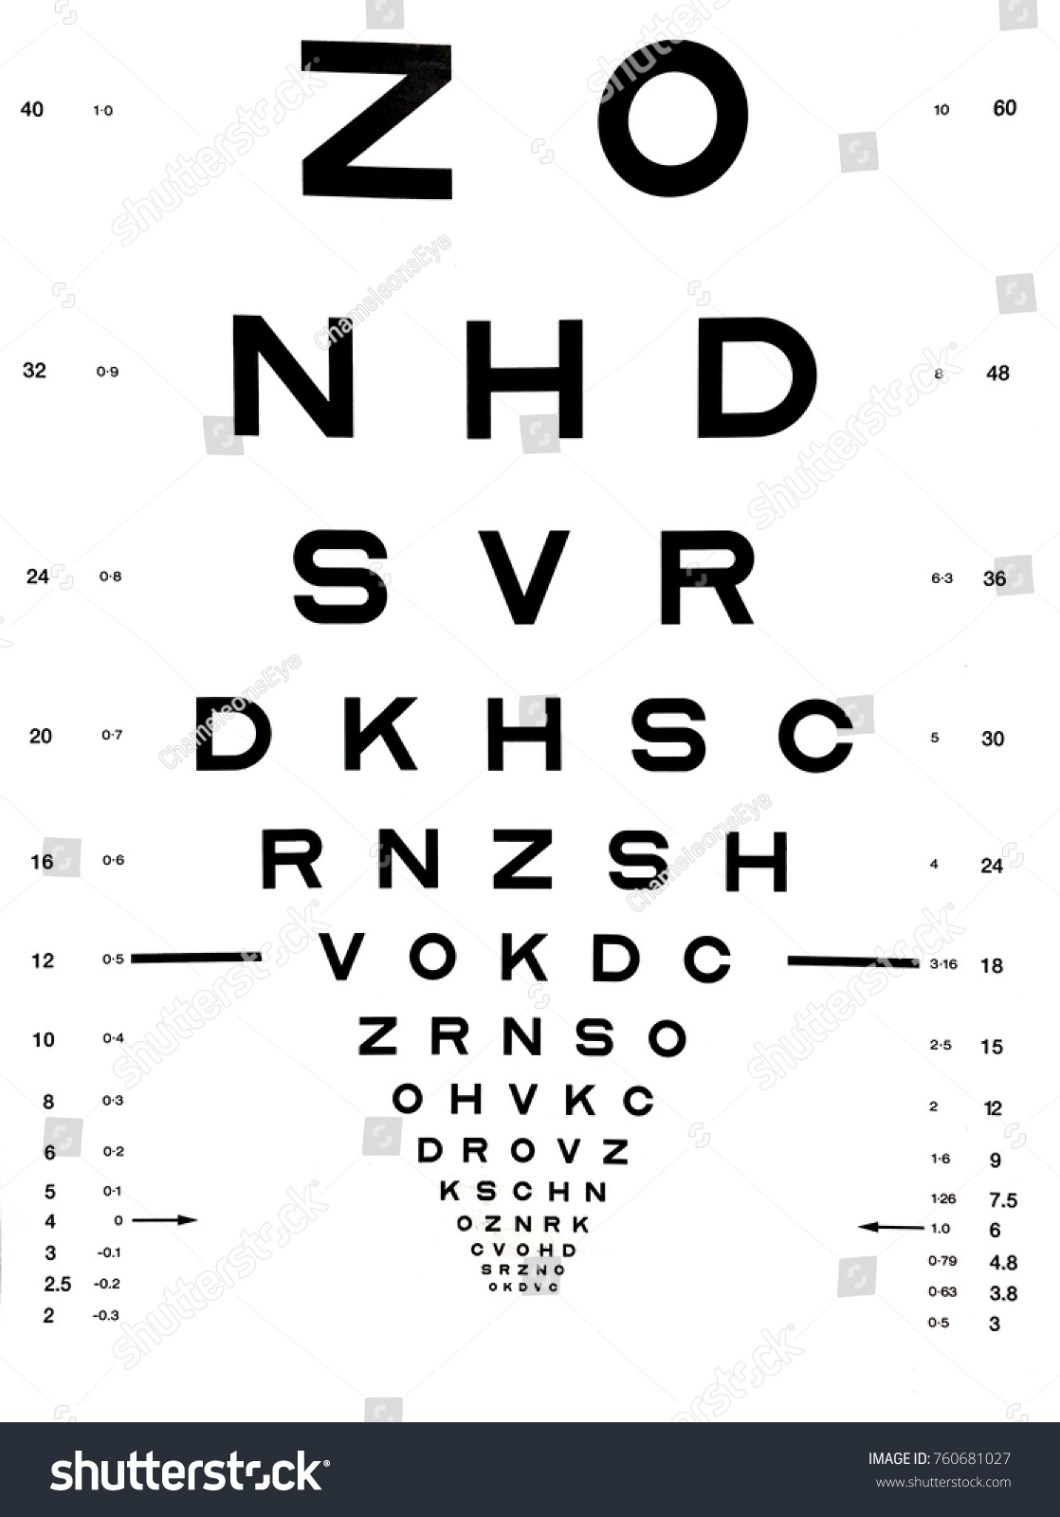 Florida dmv eye test chart decorativestyle florida dmv eye test chart decorativestyle org nvjuhfo Image collections